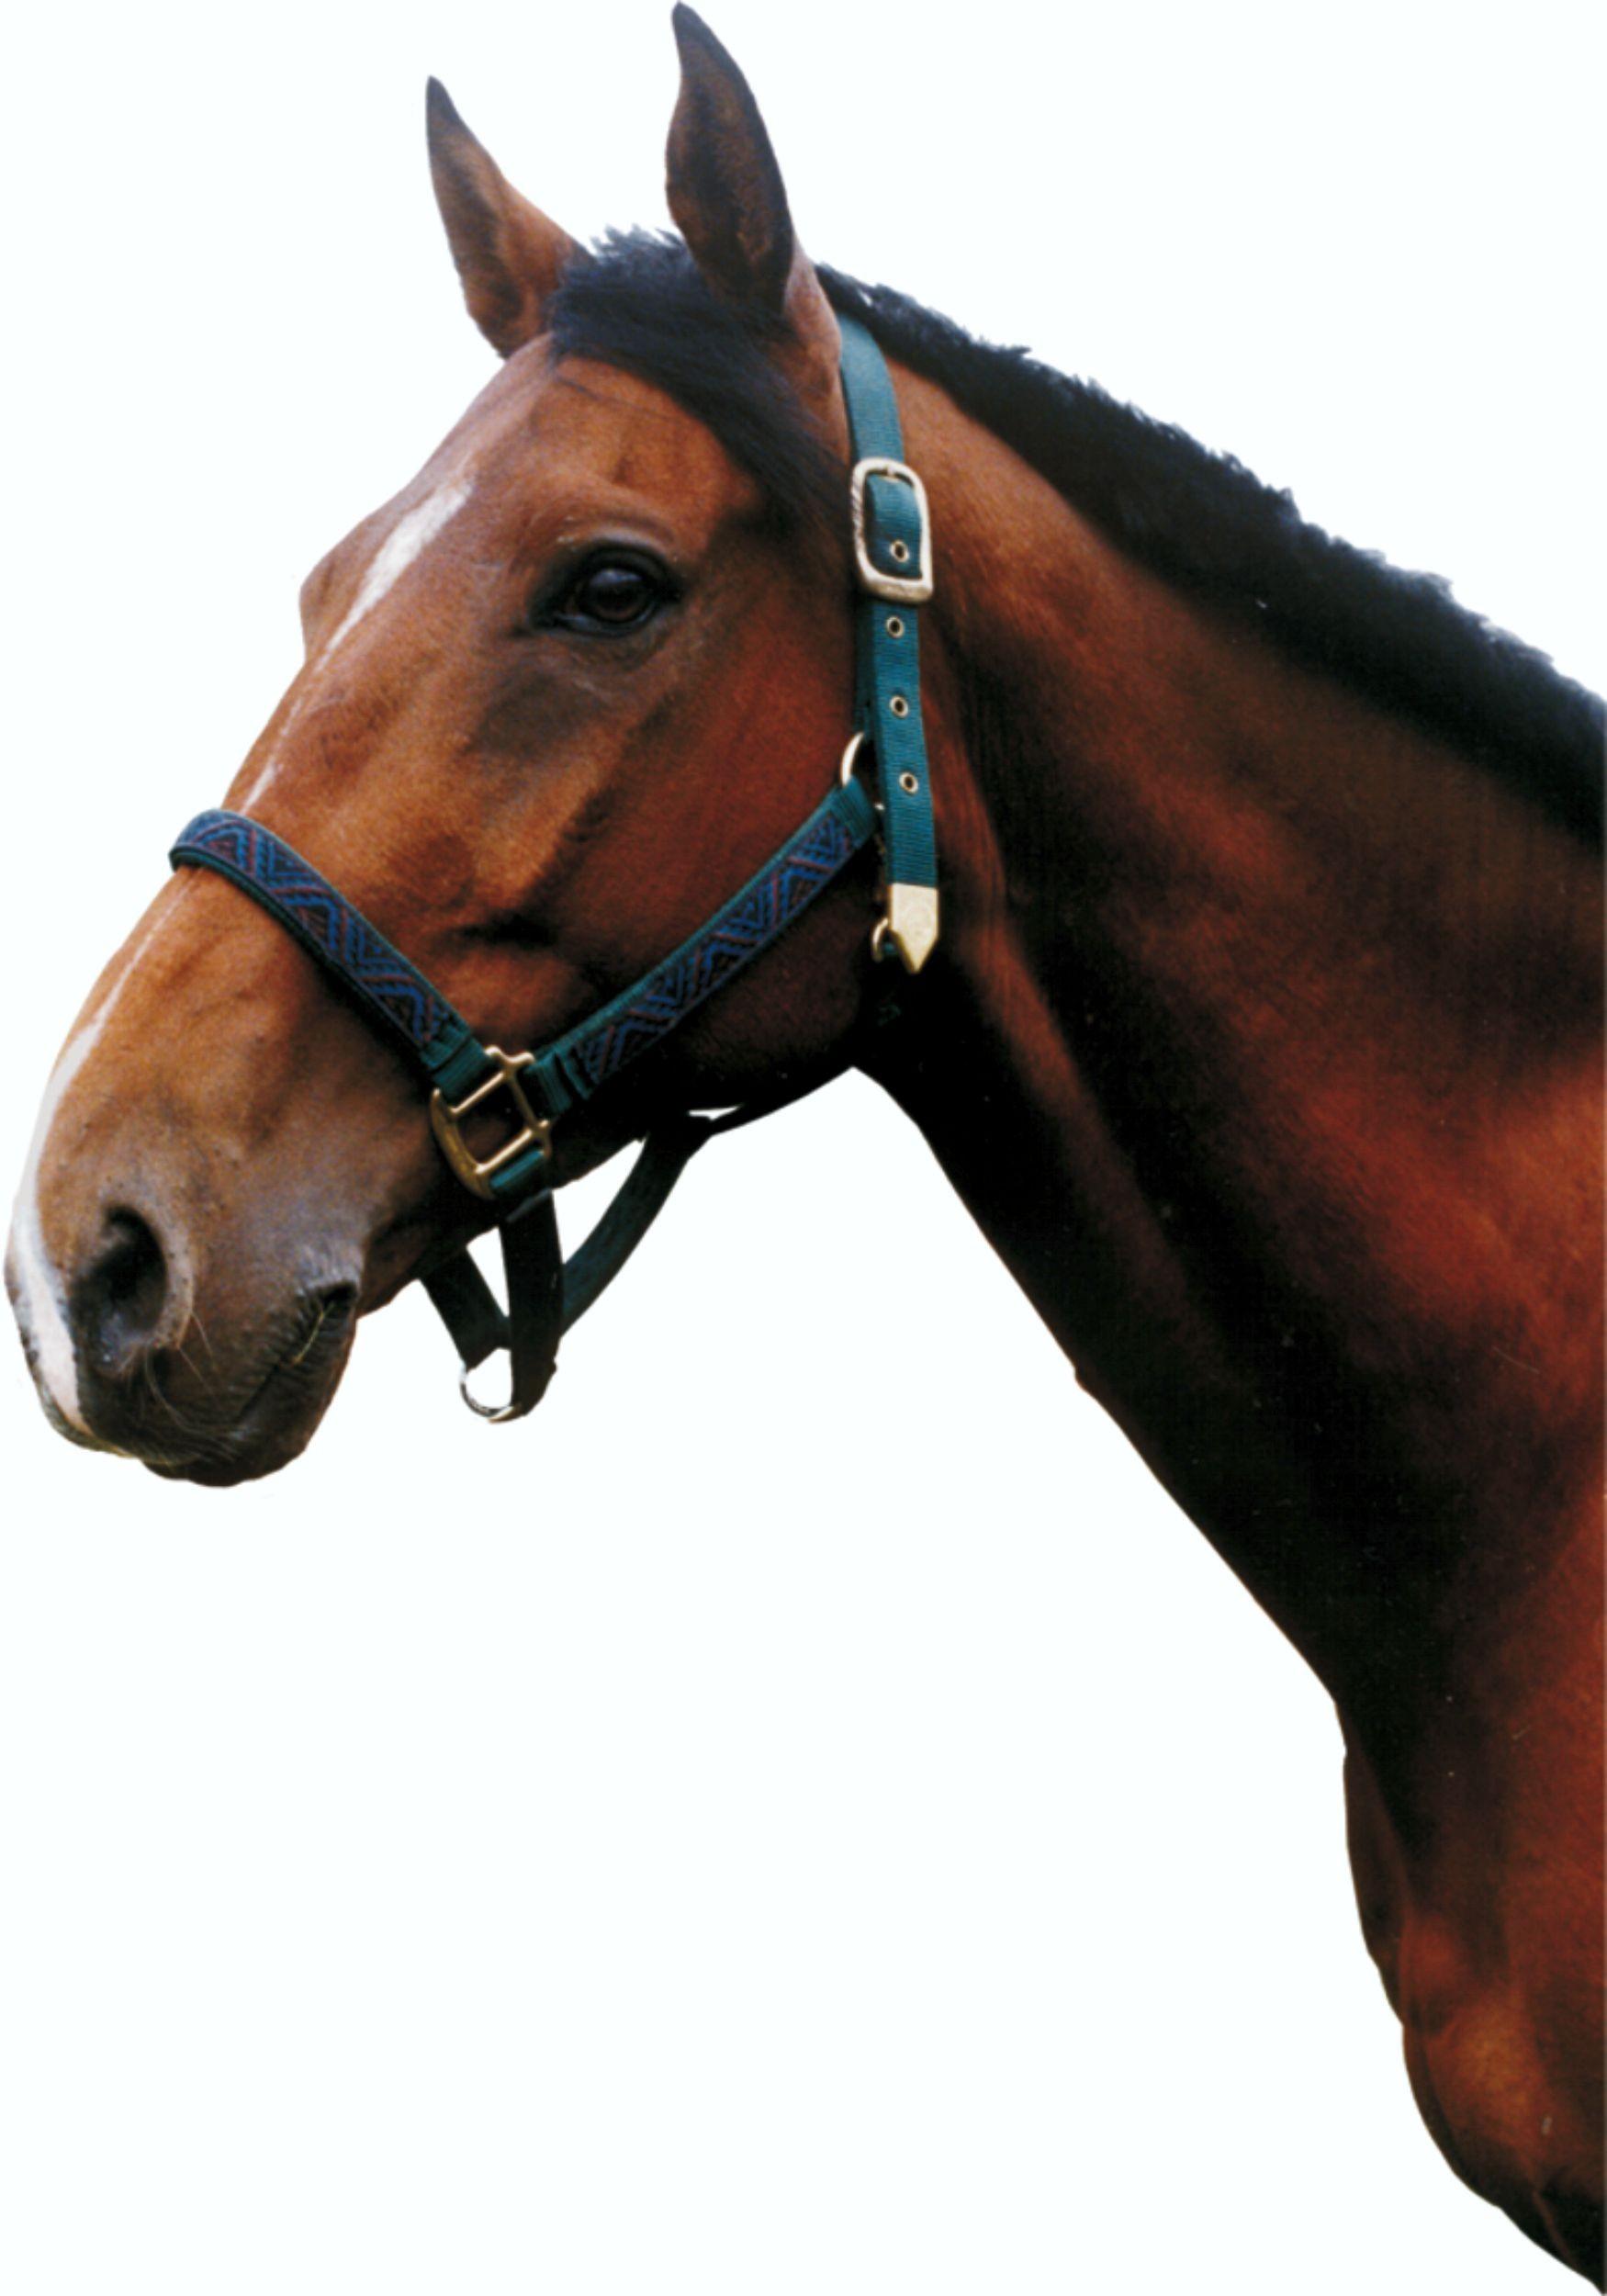 Autocollant cheval 210 x 145 mm – Bild 1